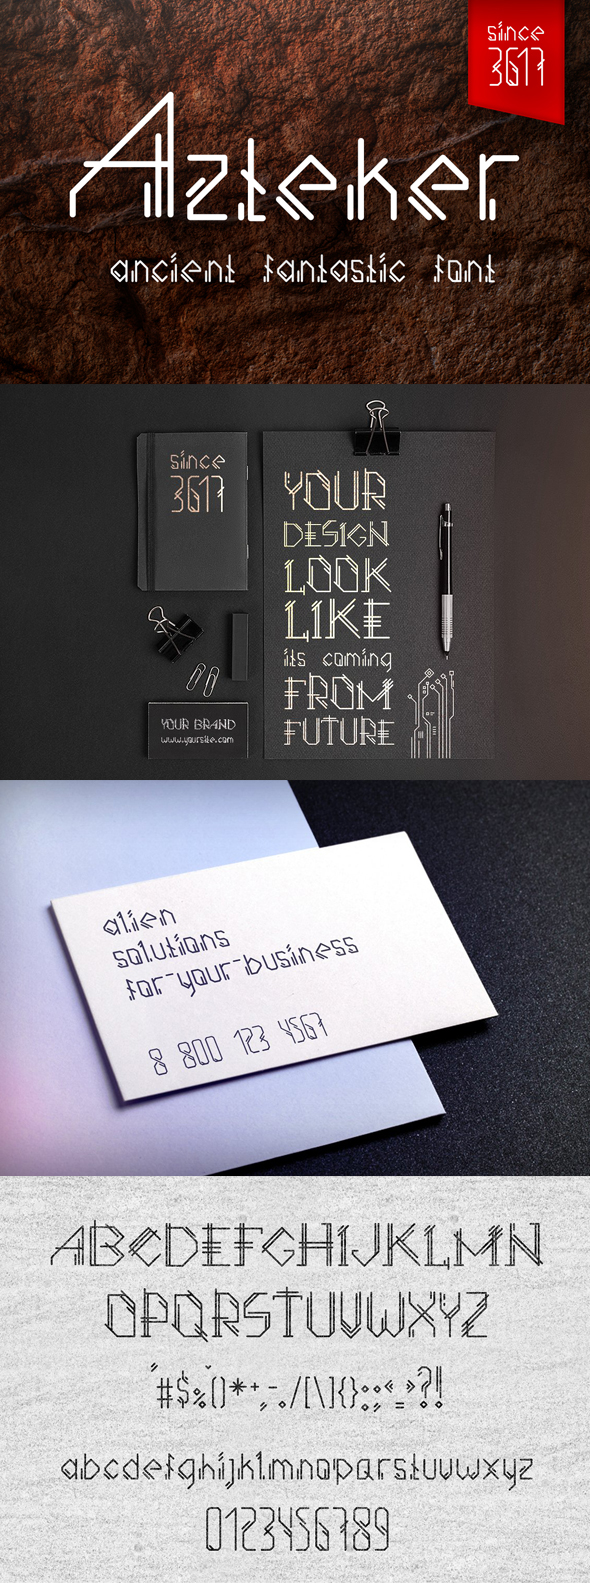 Free Font Azteker - Ancient Fantastic Font Download